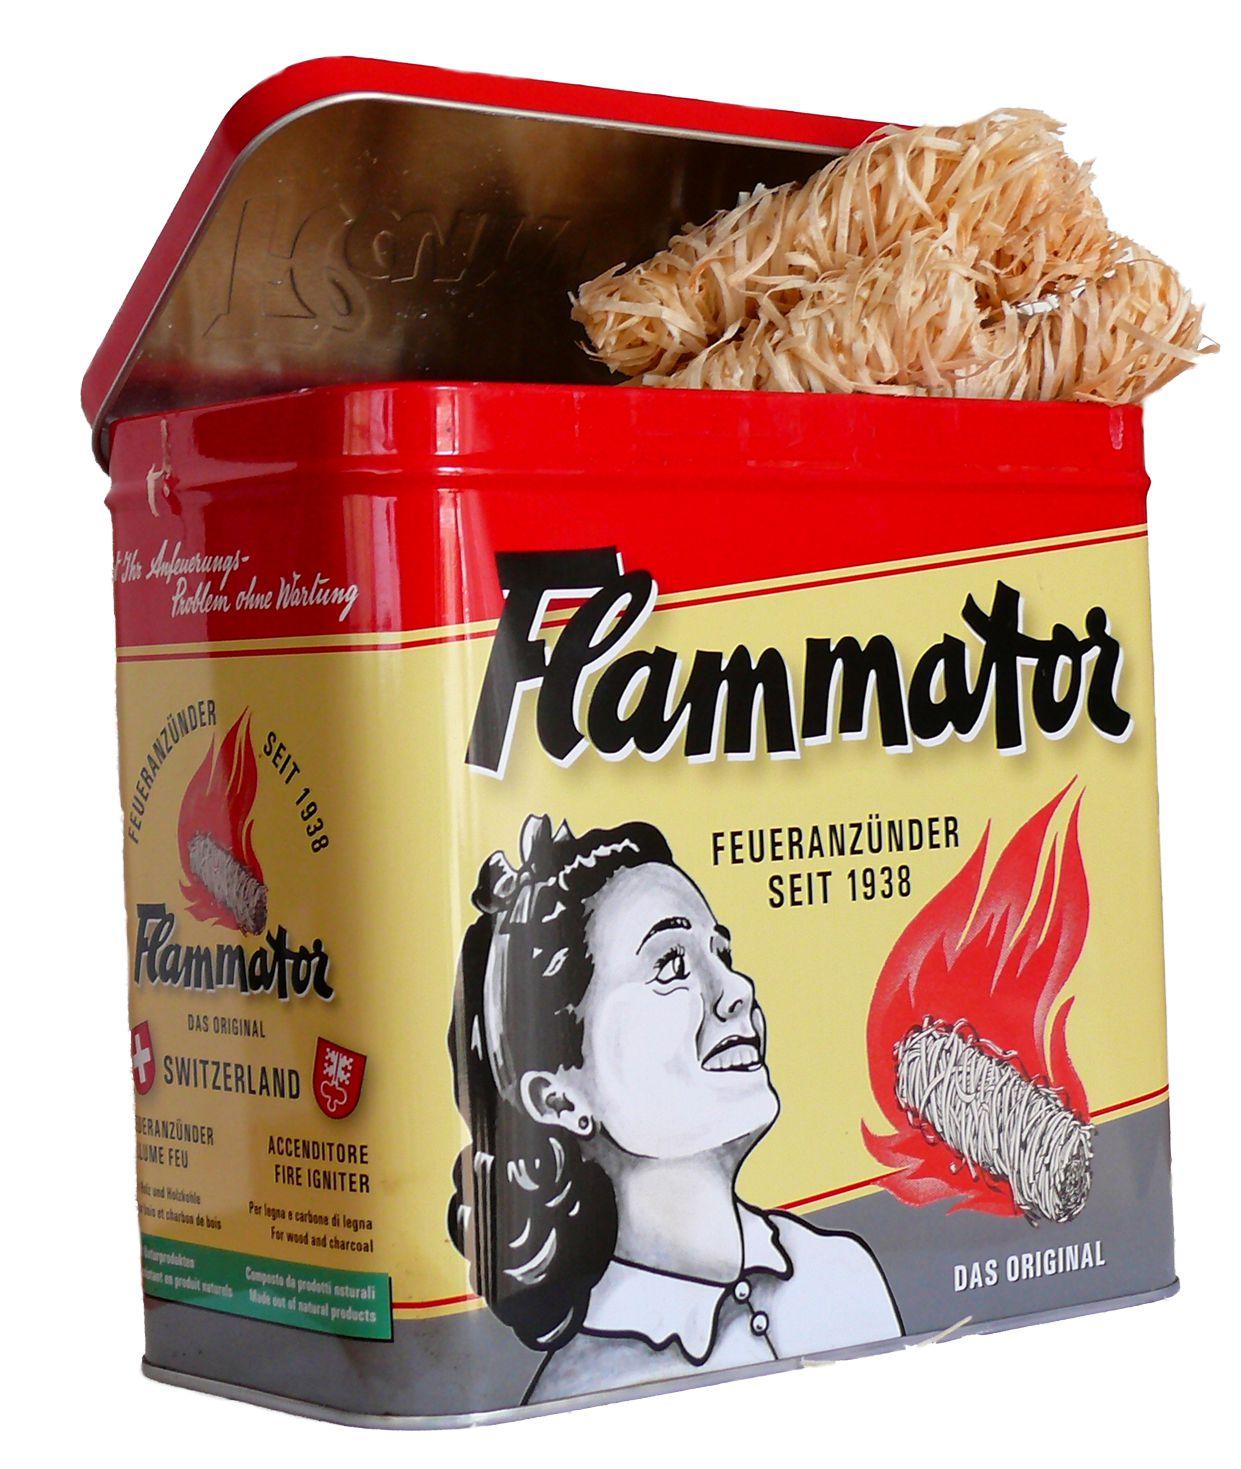 Flammator Nostalgiebox 600g Karton